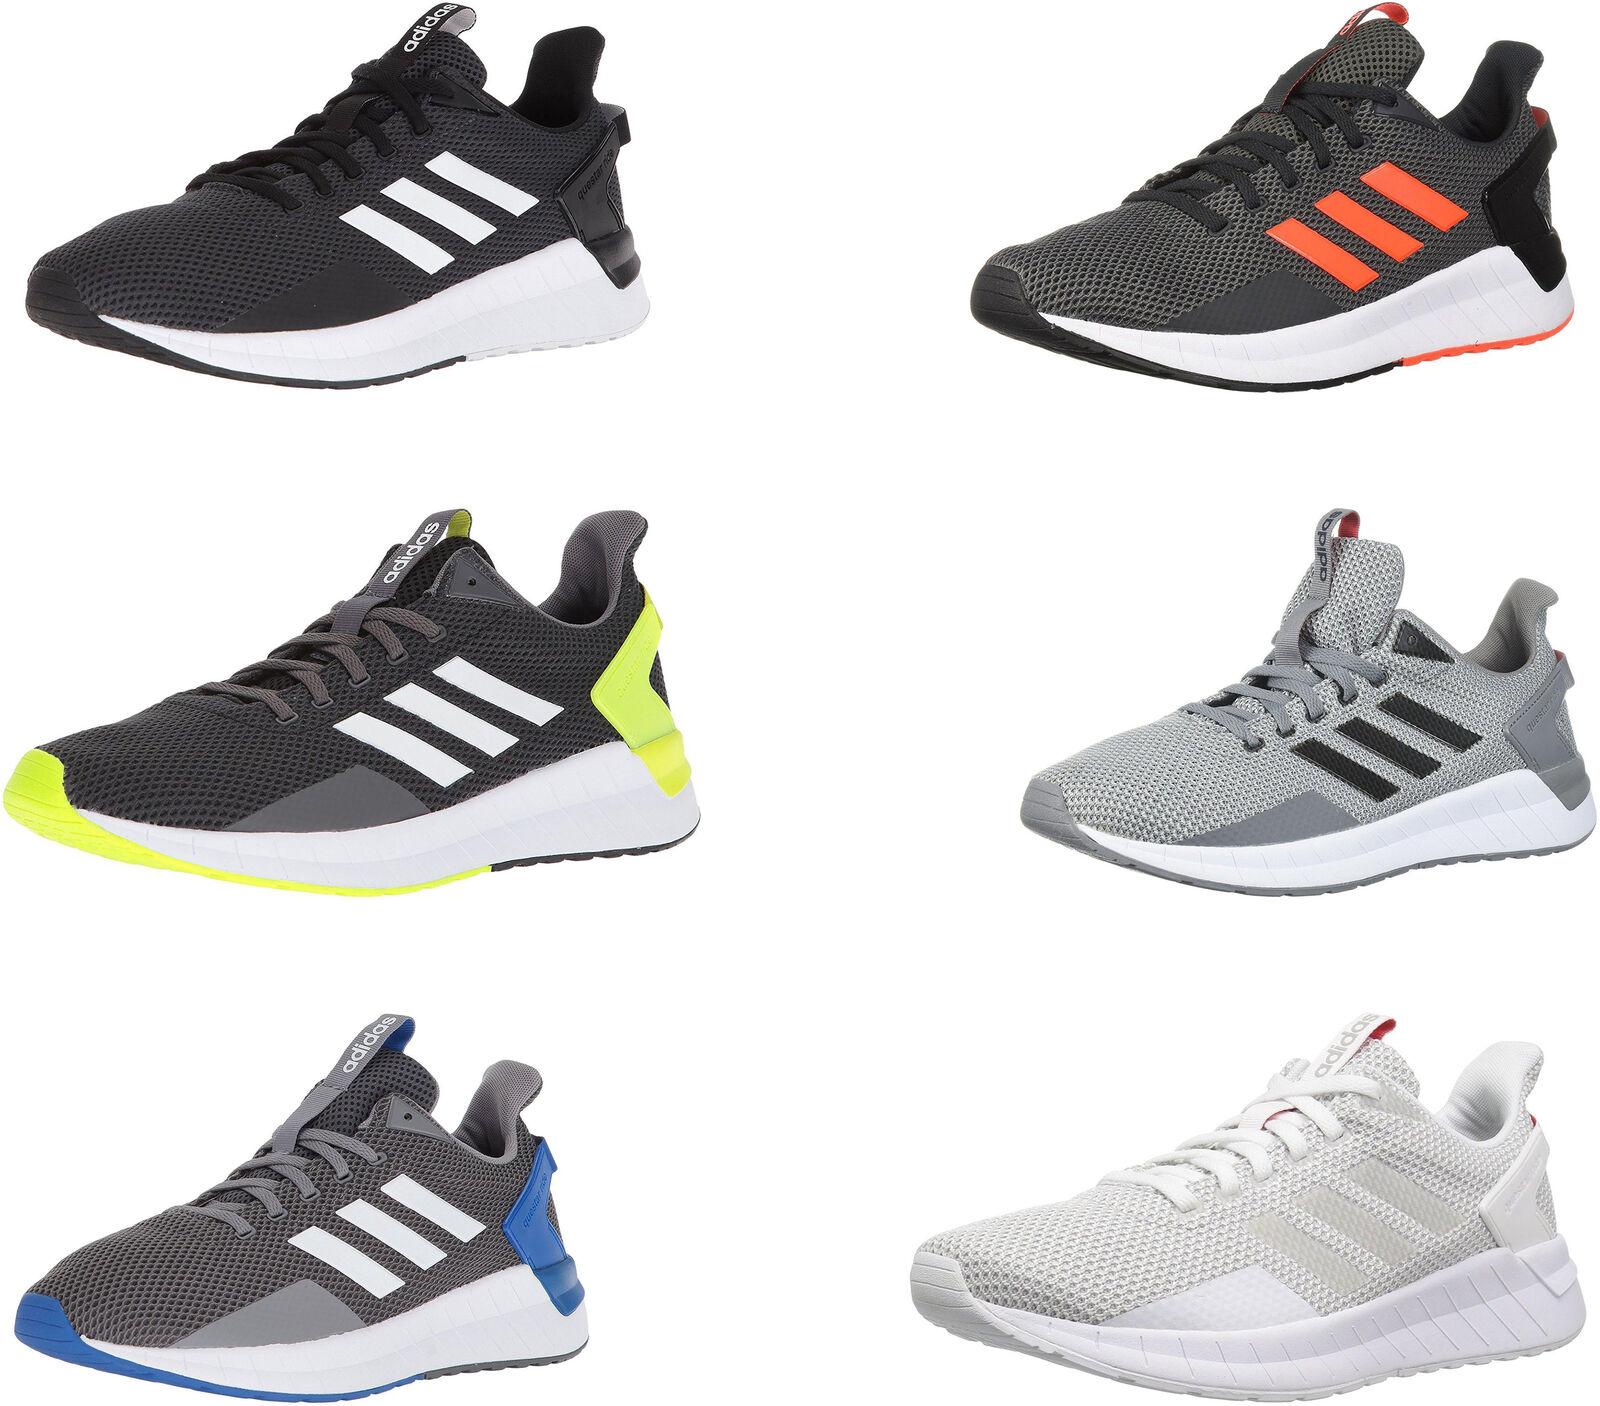 official photos a8d6d 671bb adidas Mens Questar Ride Running Shoes, 6 Colors